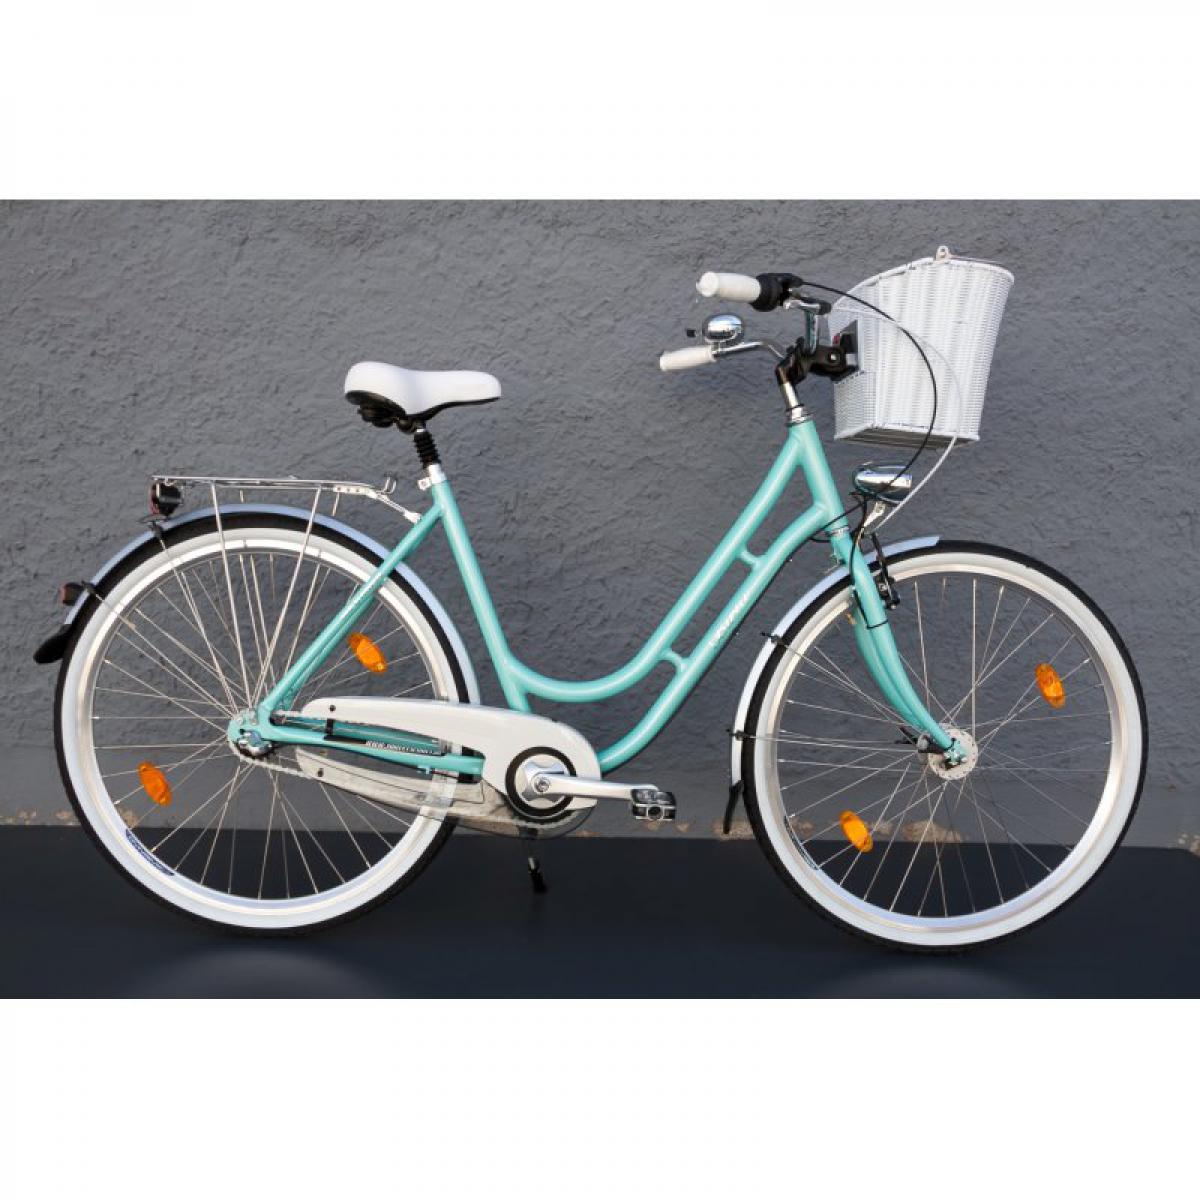 28 zoll alu damen city fahrrad 3 gang shimano nexus nabendynamo retro classic ebay. Black Bedroom Furniture Sets. Home Design Ideas